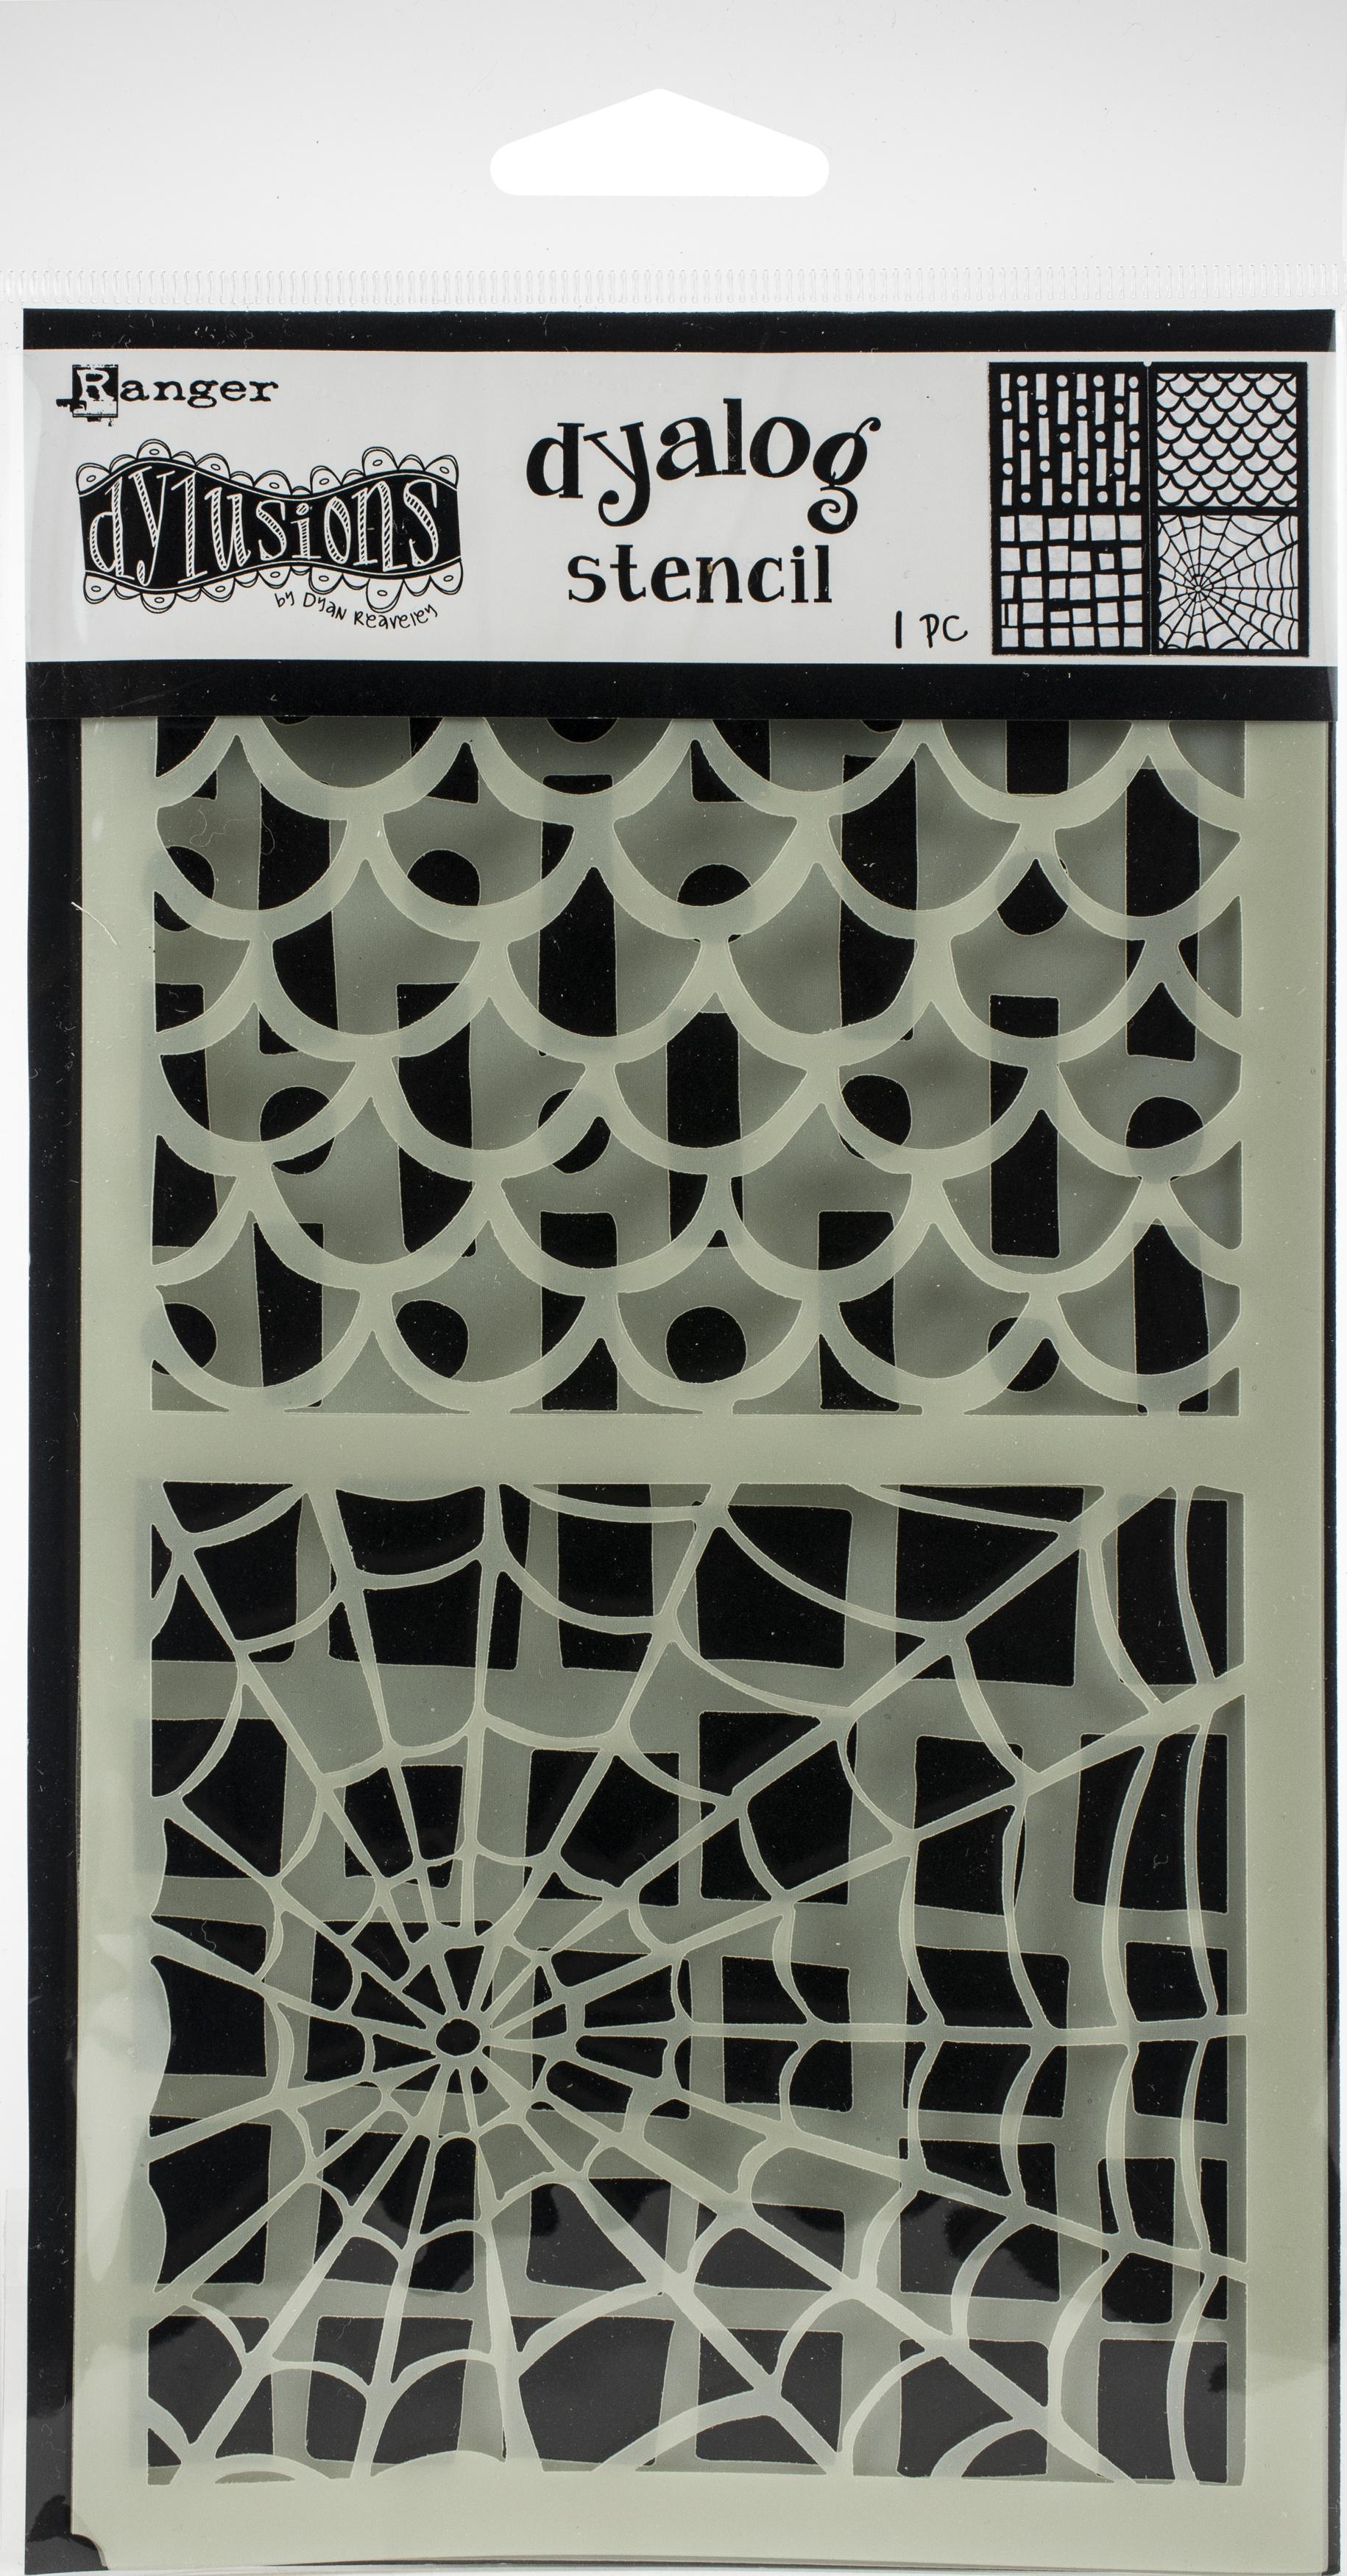 Dyan Reaveley's Dylusions Dyalog Stencil-Stencil It Too